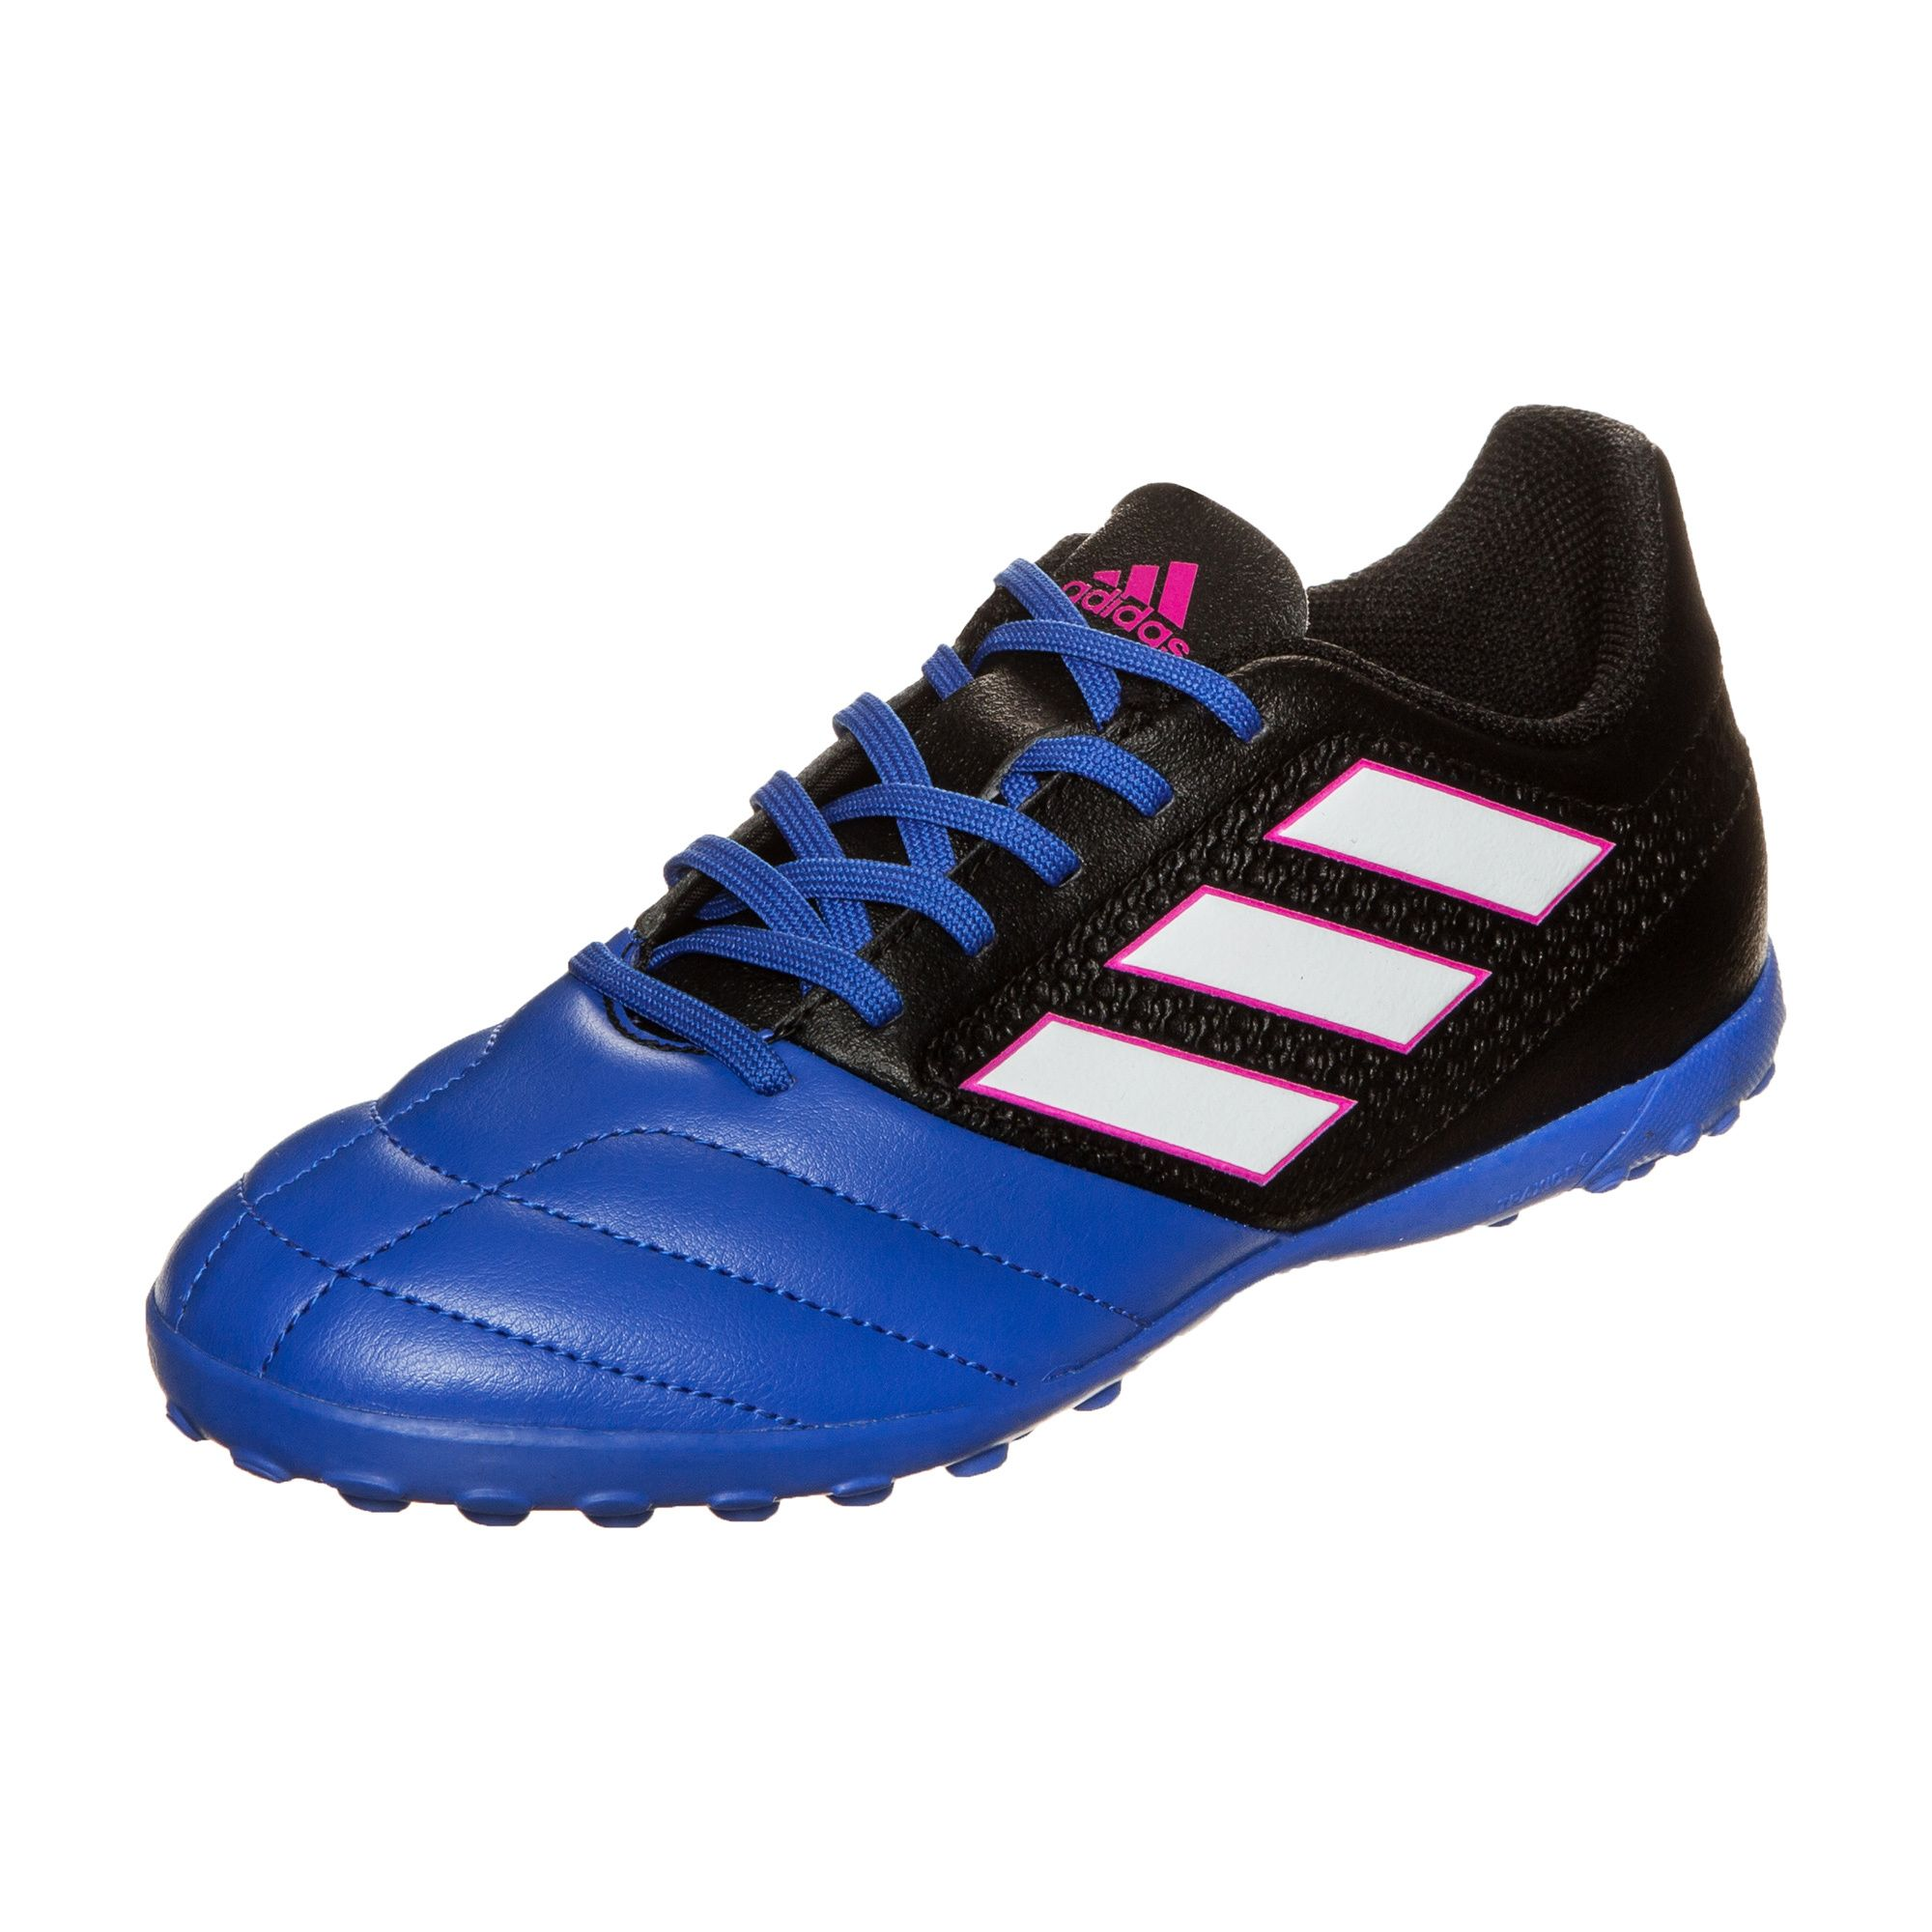 ADIDAS PERFORMANCE adidas Performance ACE 17.4 TF Fußballschuh Kinder